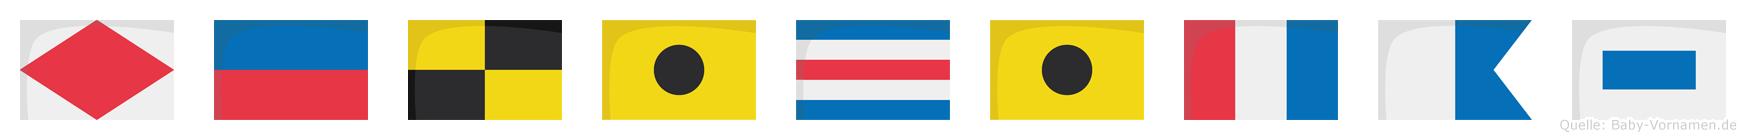 Felicitas im Flaggenalphabet